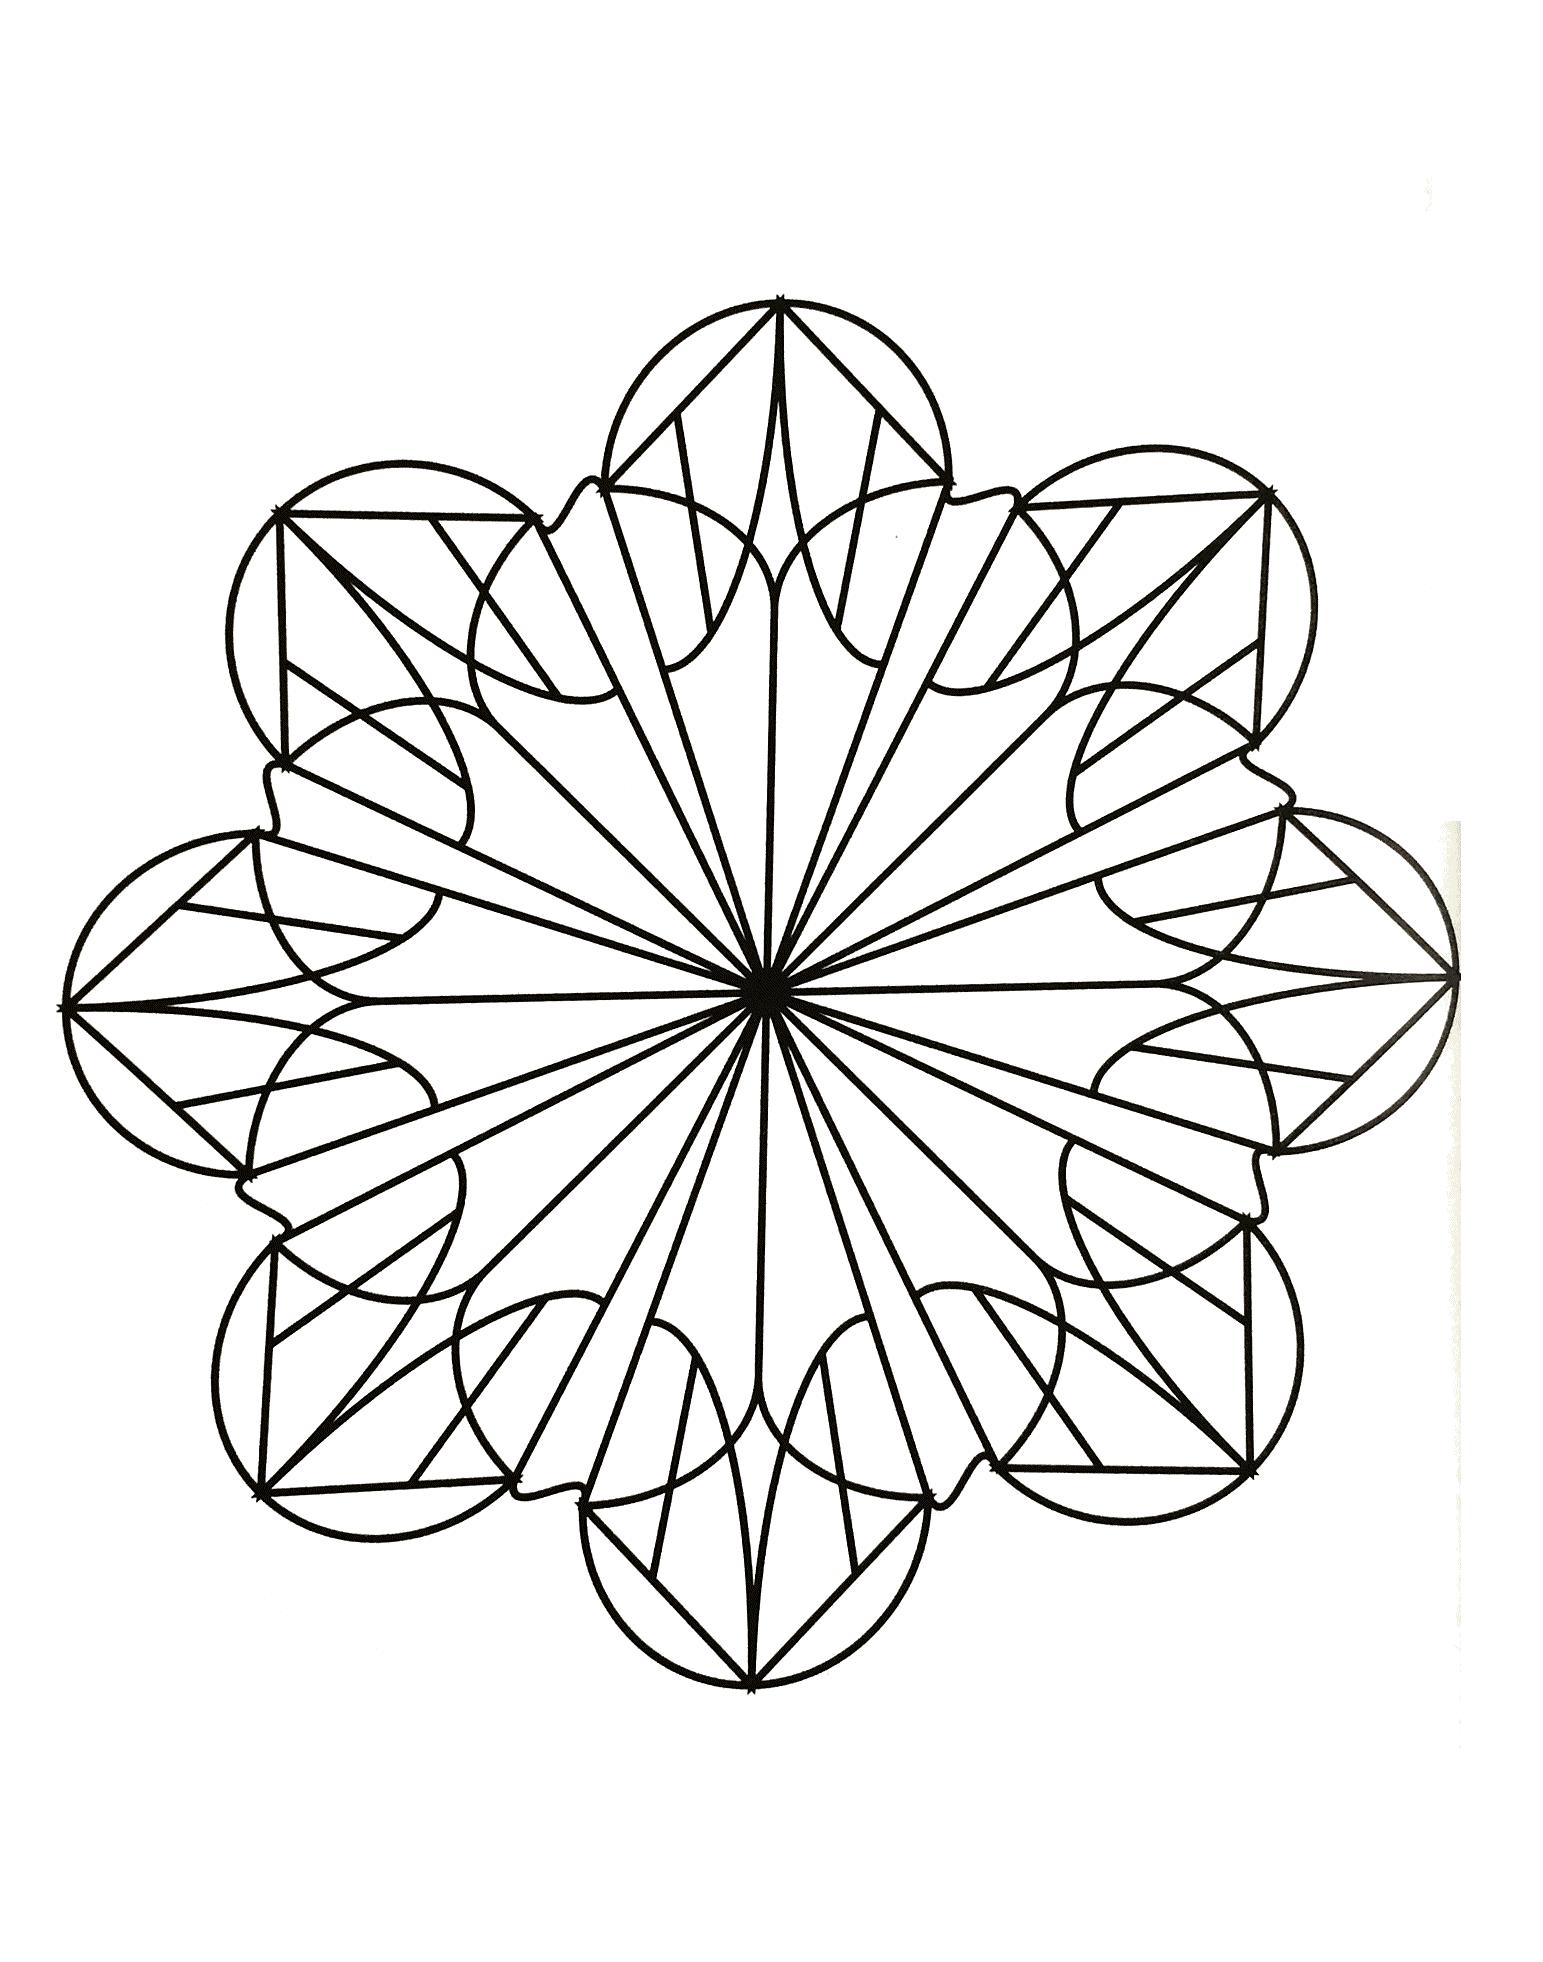 Simple mandala 55 - Mandalas Coloring pages for kids to ...